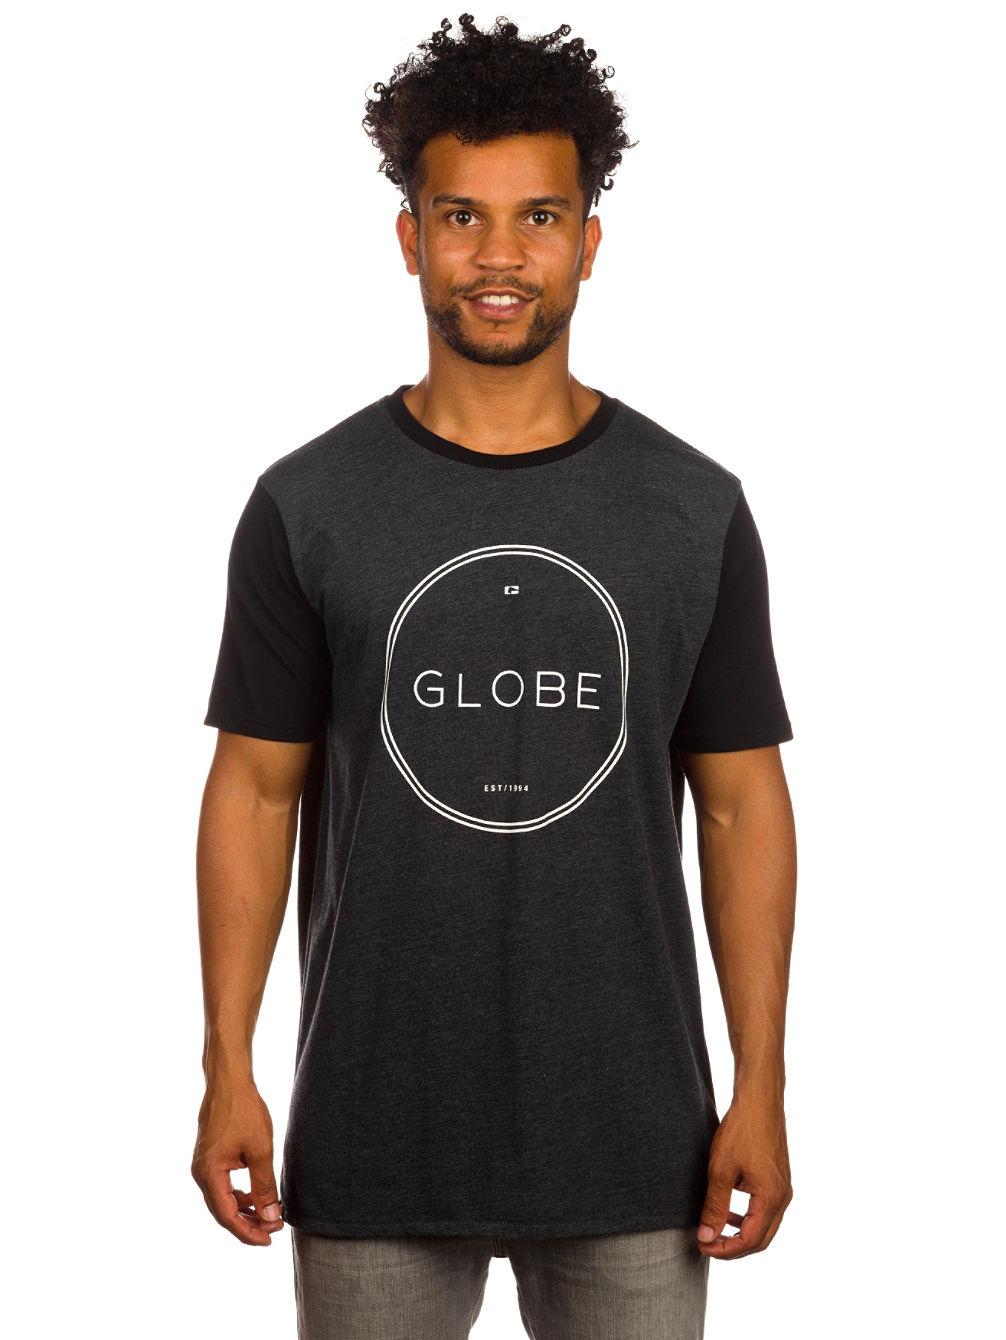 globe-windsor-t-shirt